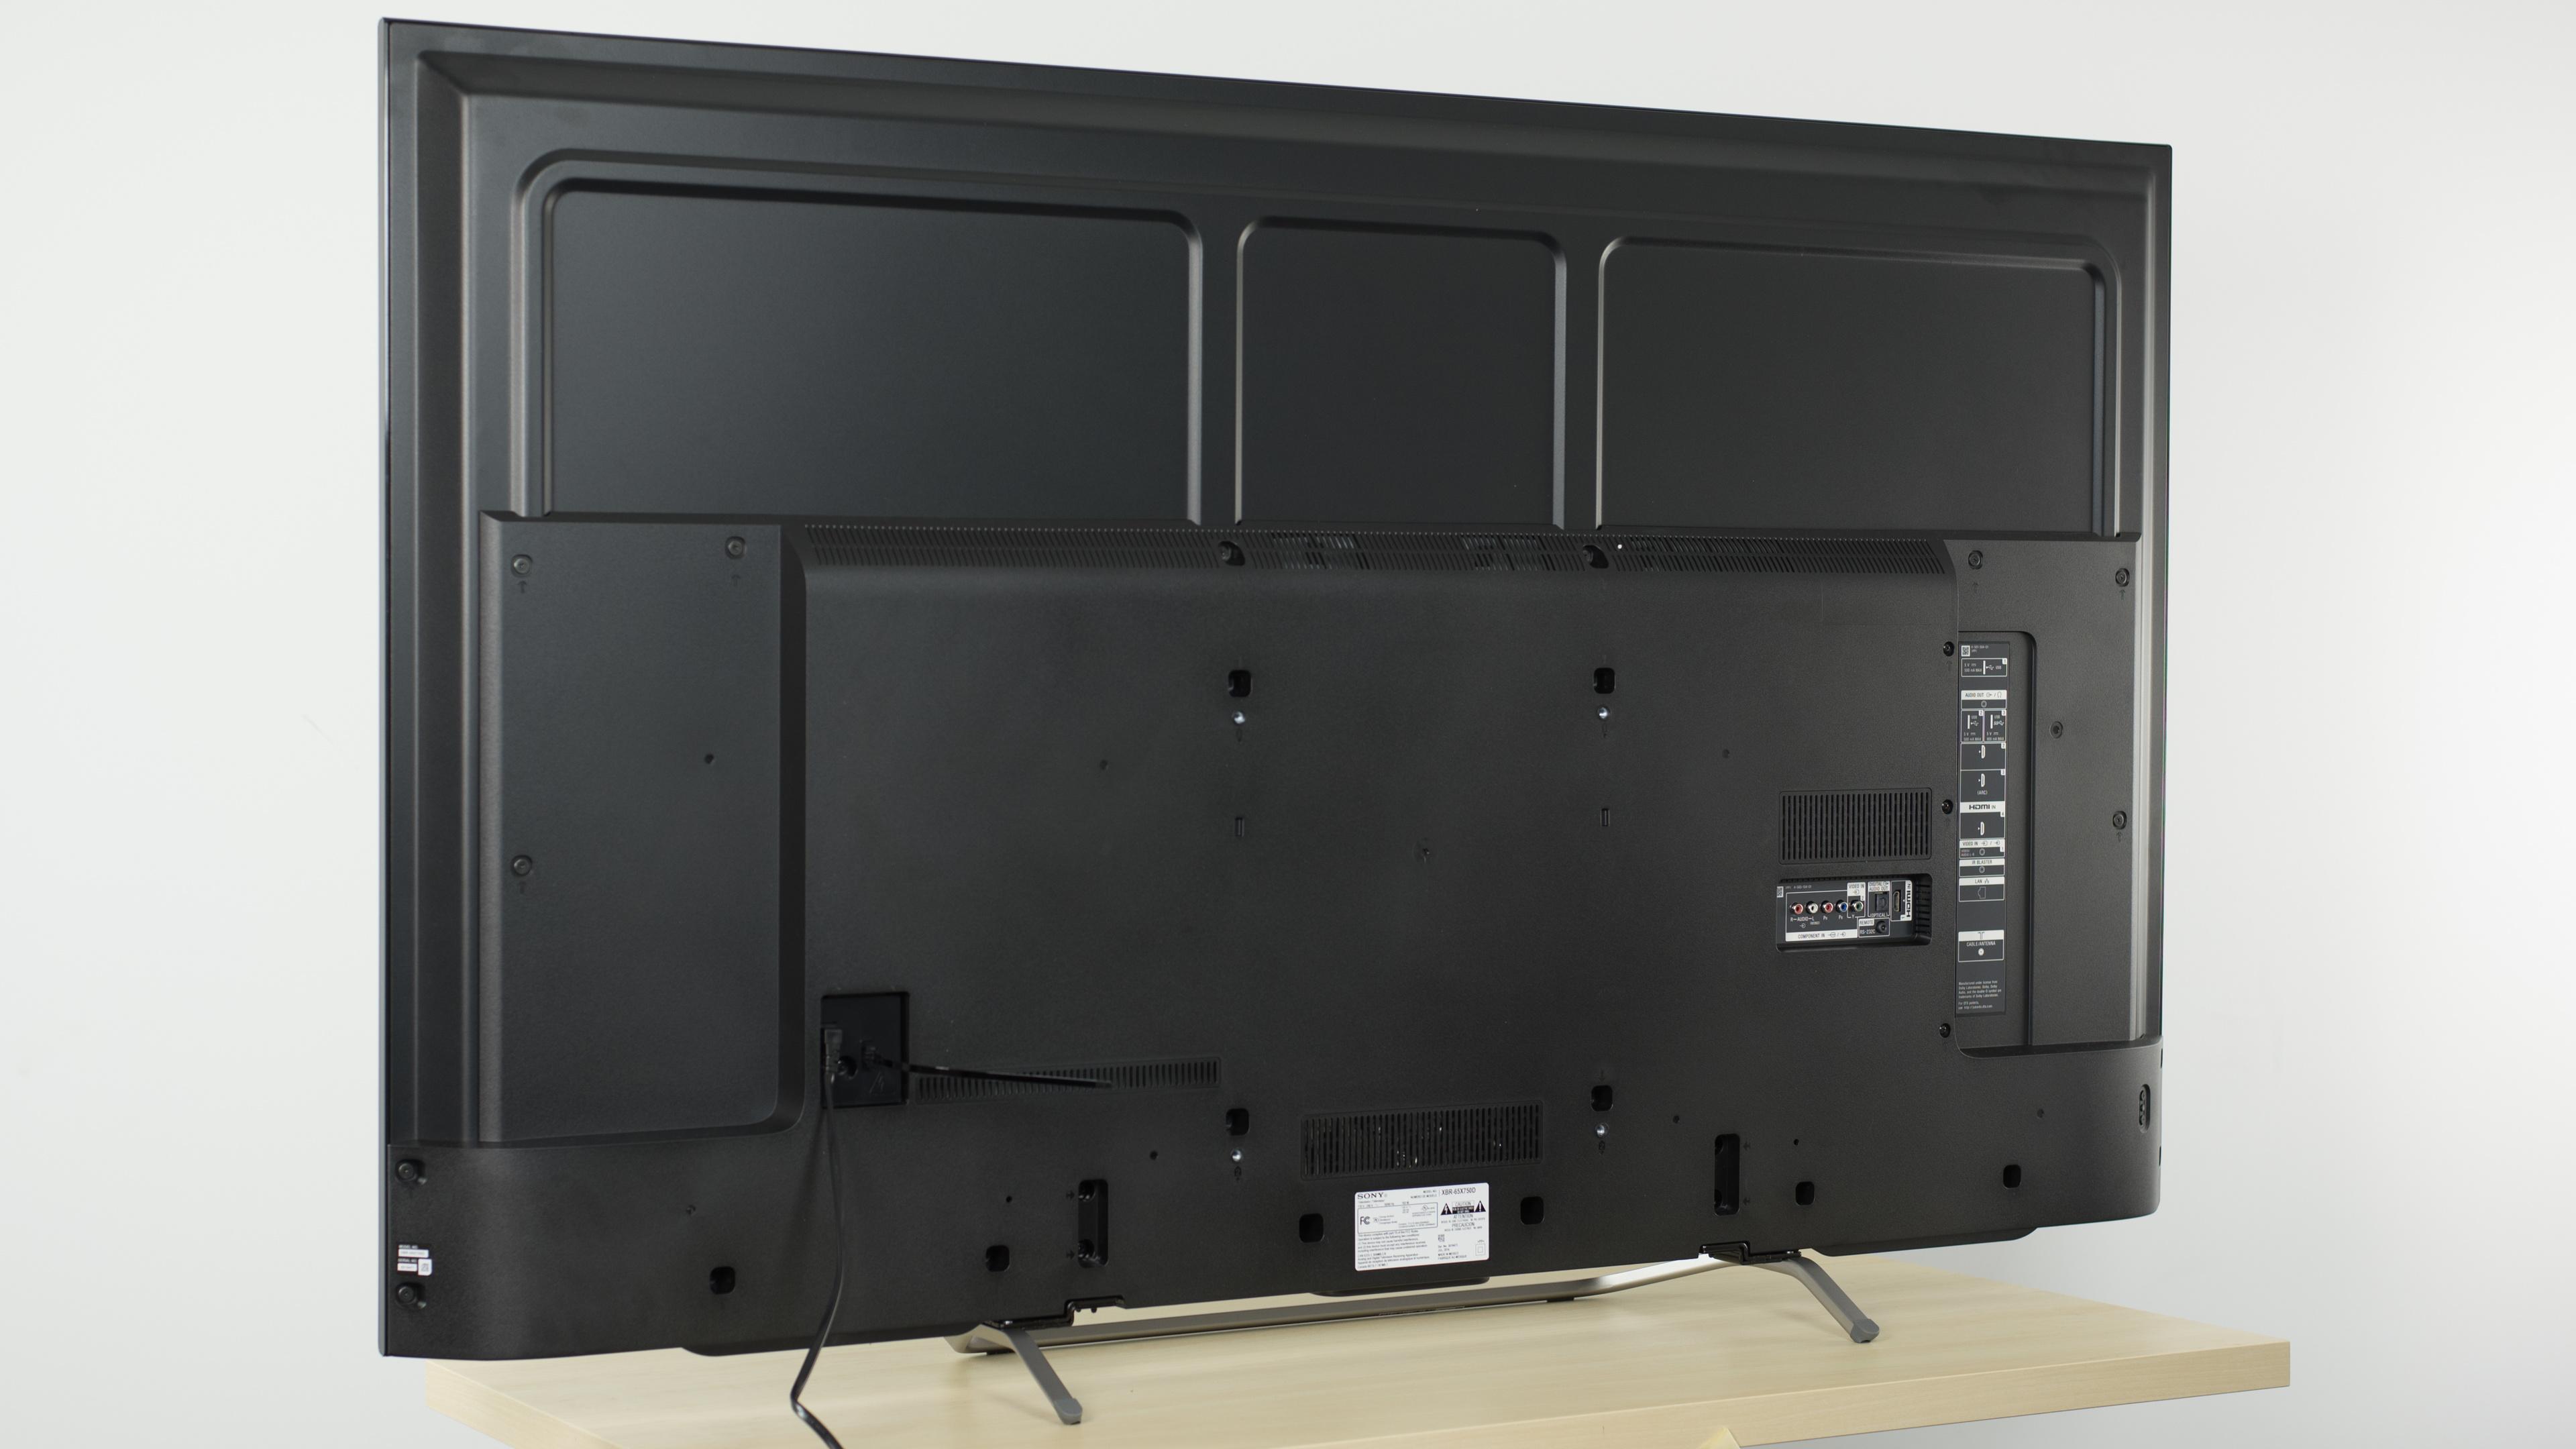 sony xbr65x750d sony xbr65x750d 65 inch 4k ultra hd smart. Black Bedroom Furniture Sets. Home Design Ideas